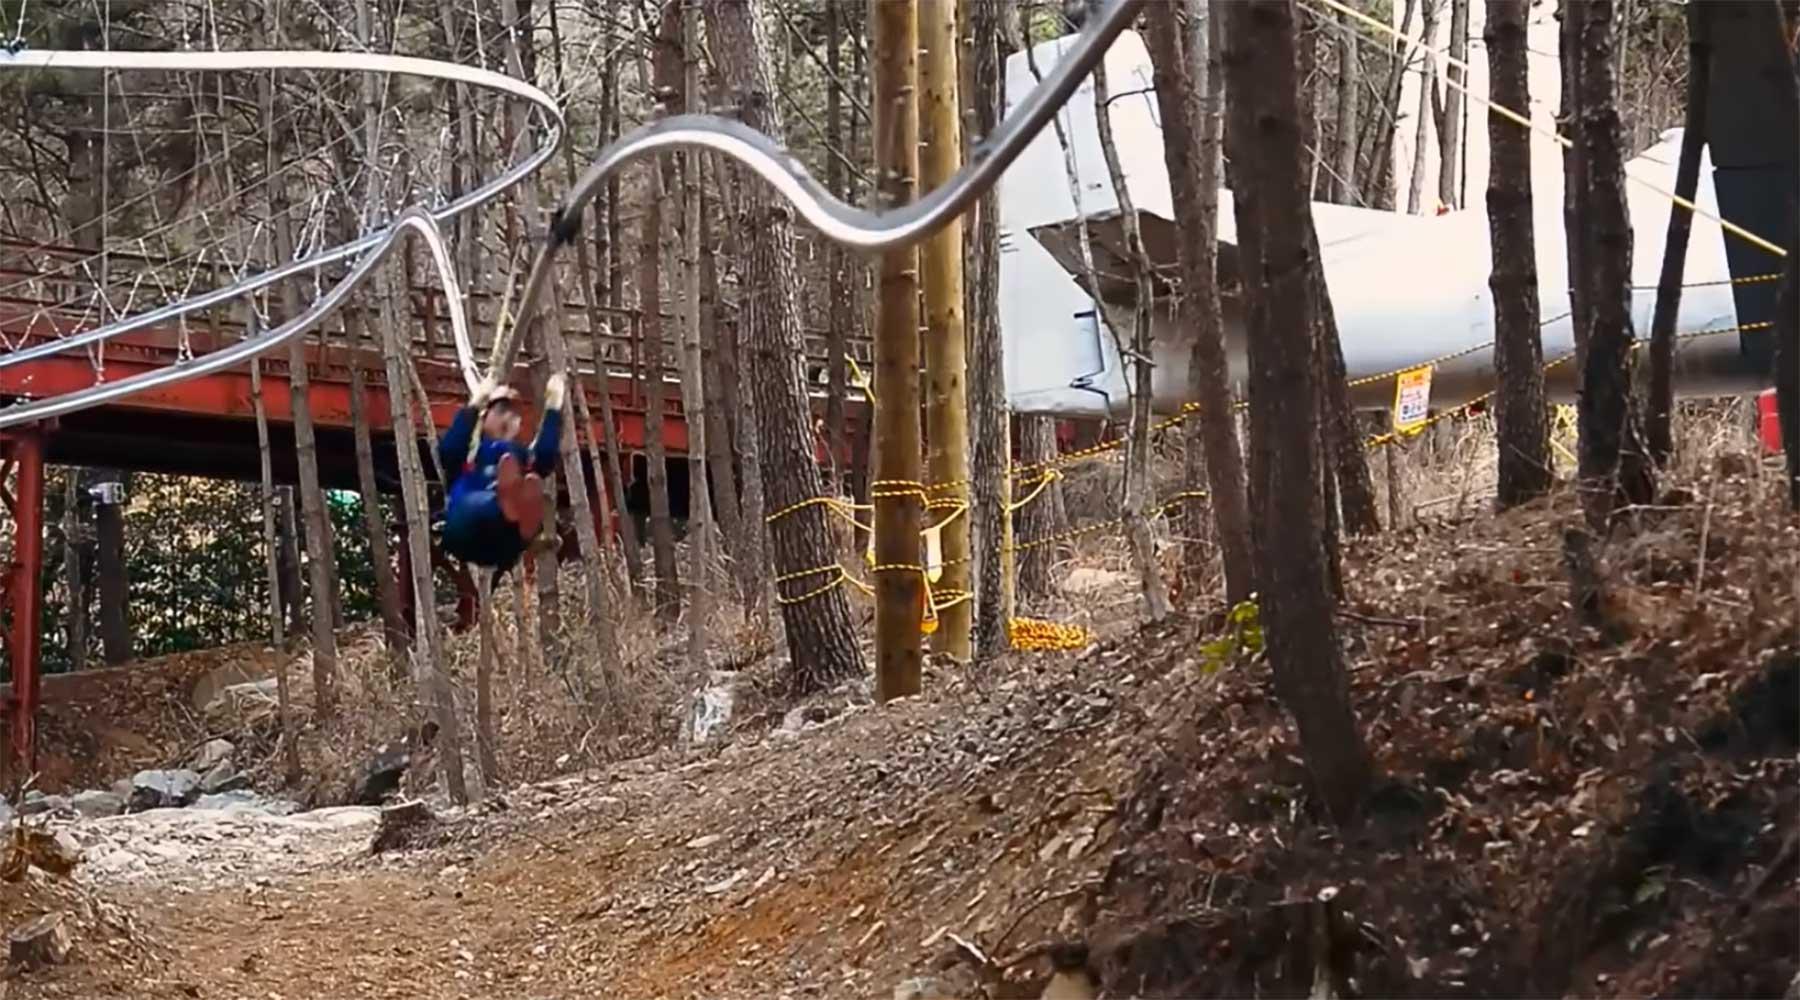 Achterseilbahn zipline-achterbahn